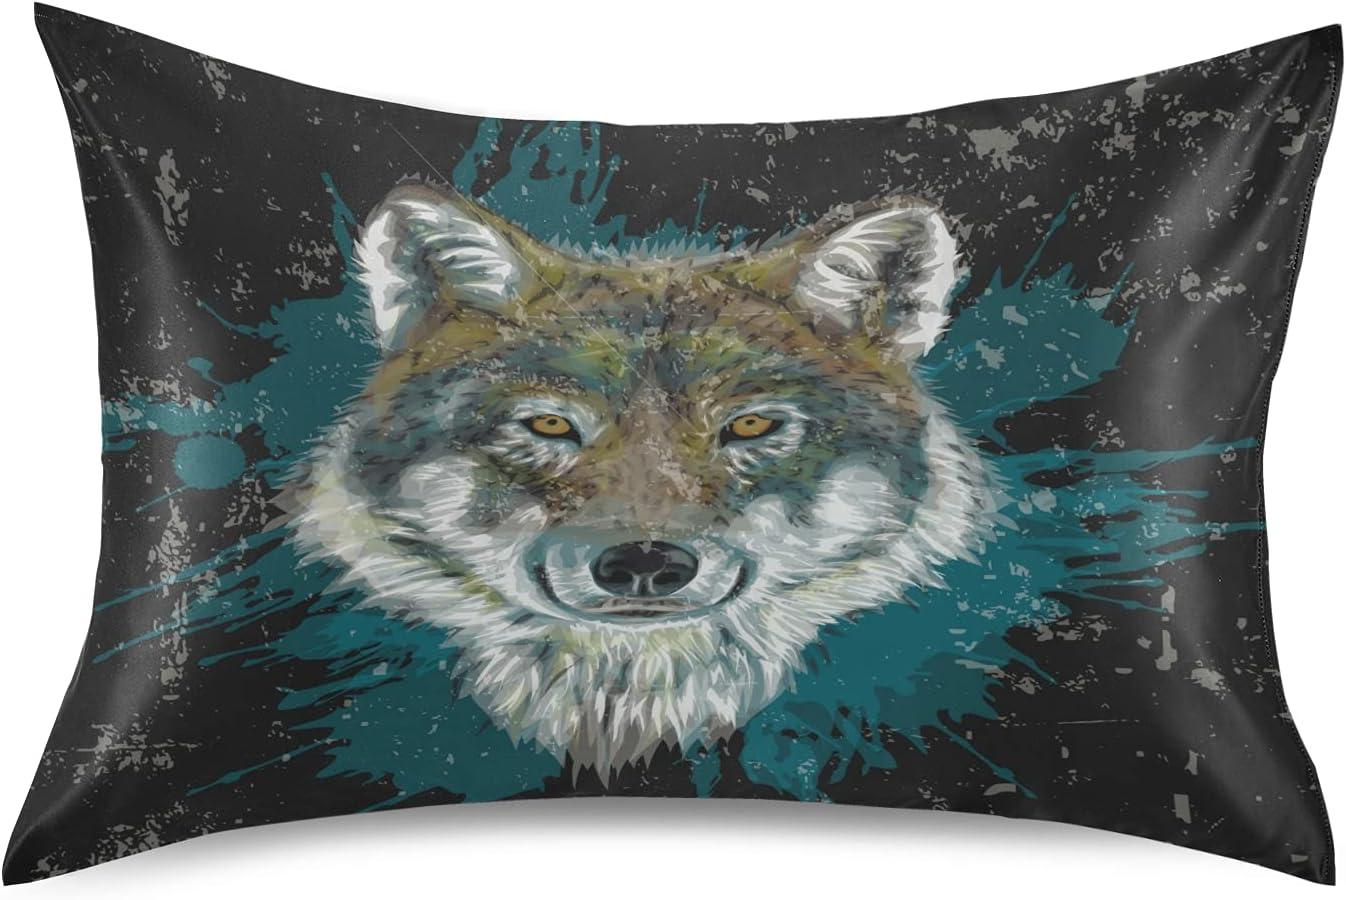 Dalzium gift Wolf Satin Ranking TOP16 Pillowcase King Grunge Silk Print Size